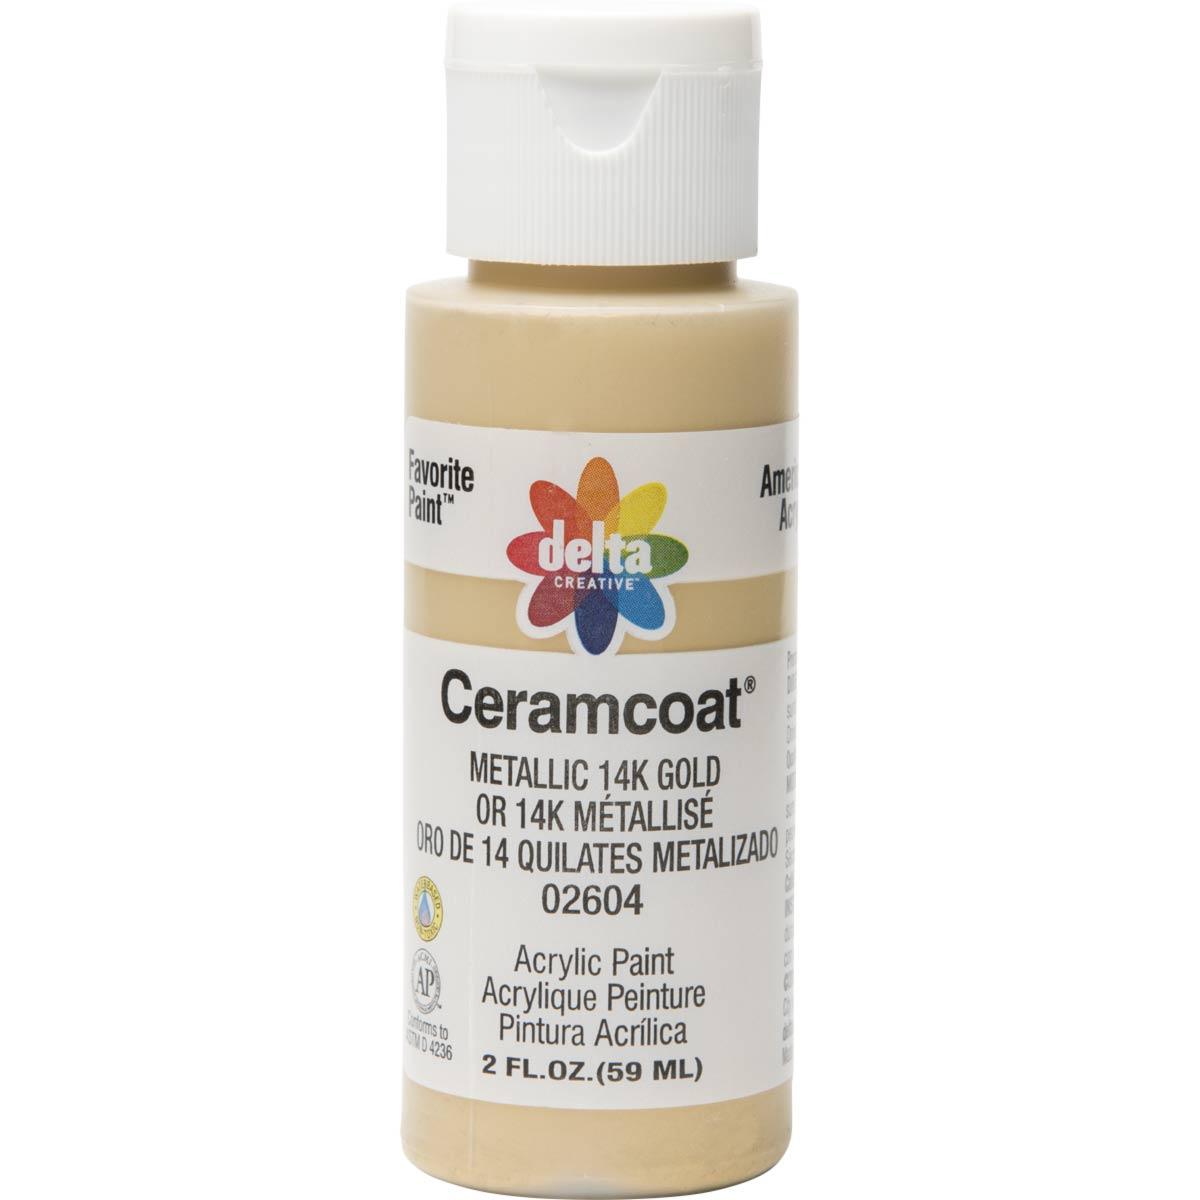 Delta Ceramcoat ® Acrylic Paint - Metallic 14K Gold, 2 oz.